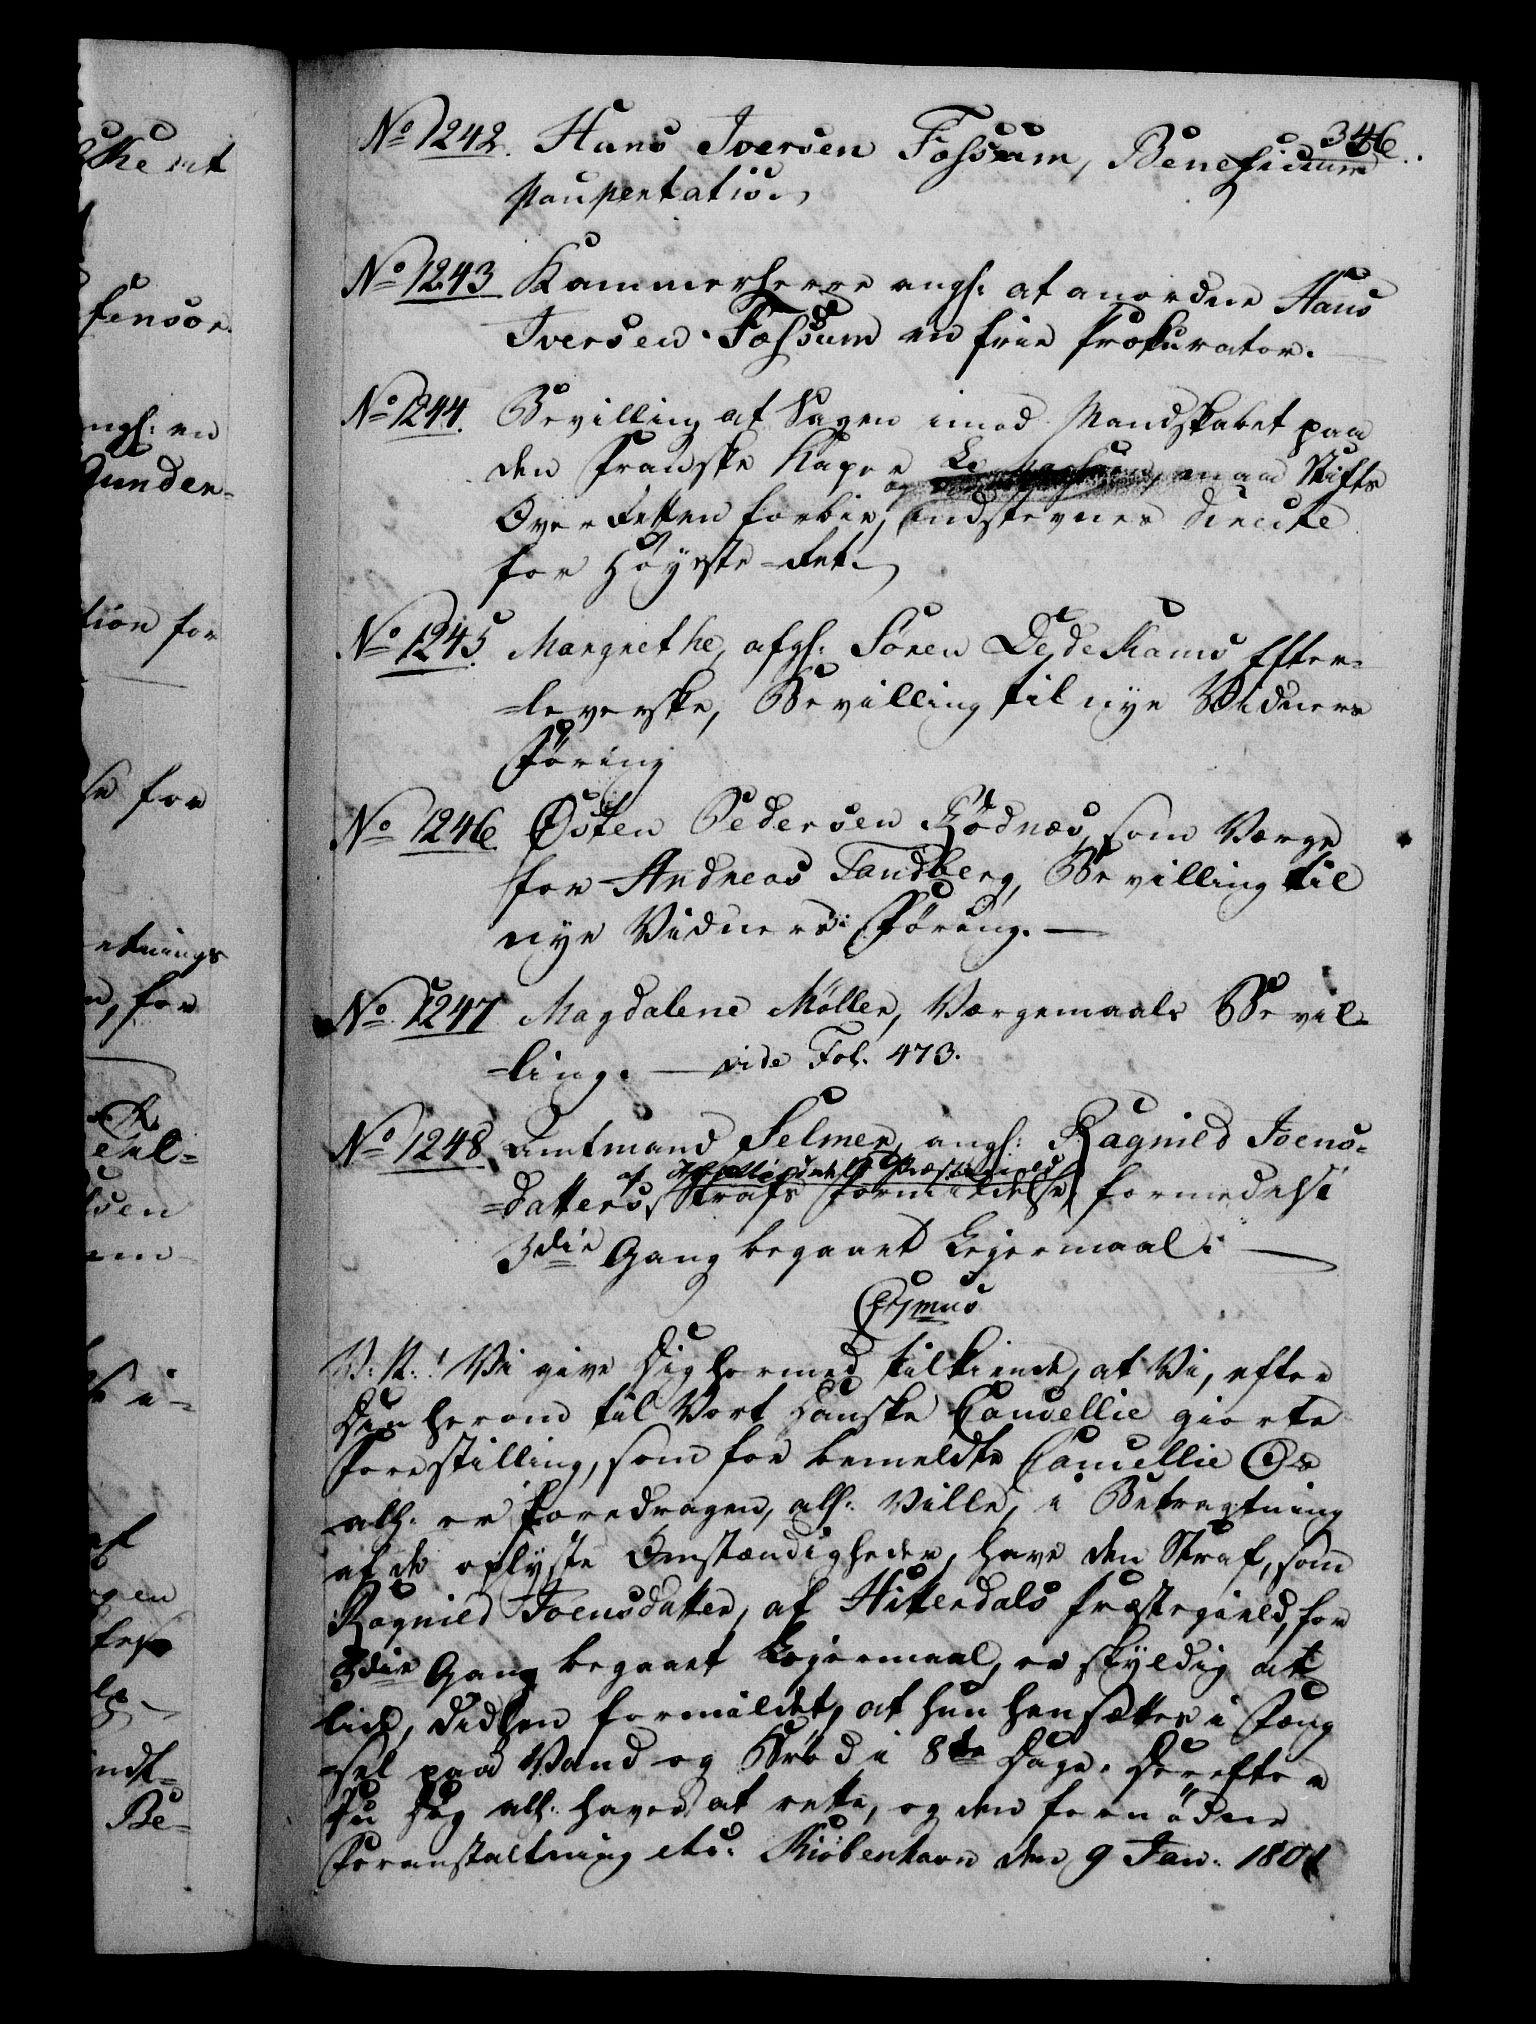 RA, Danske Kanselli 1800-1814, H/Hf/Hfb/Hfba/L0001: Registranter, 1800-1801, s. 346a